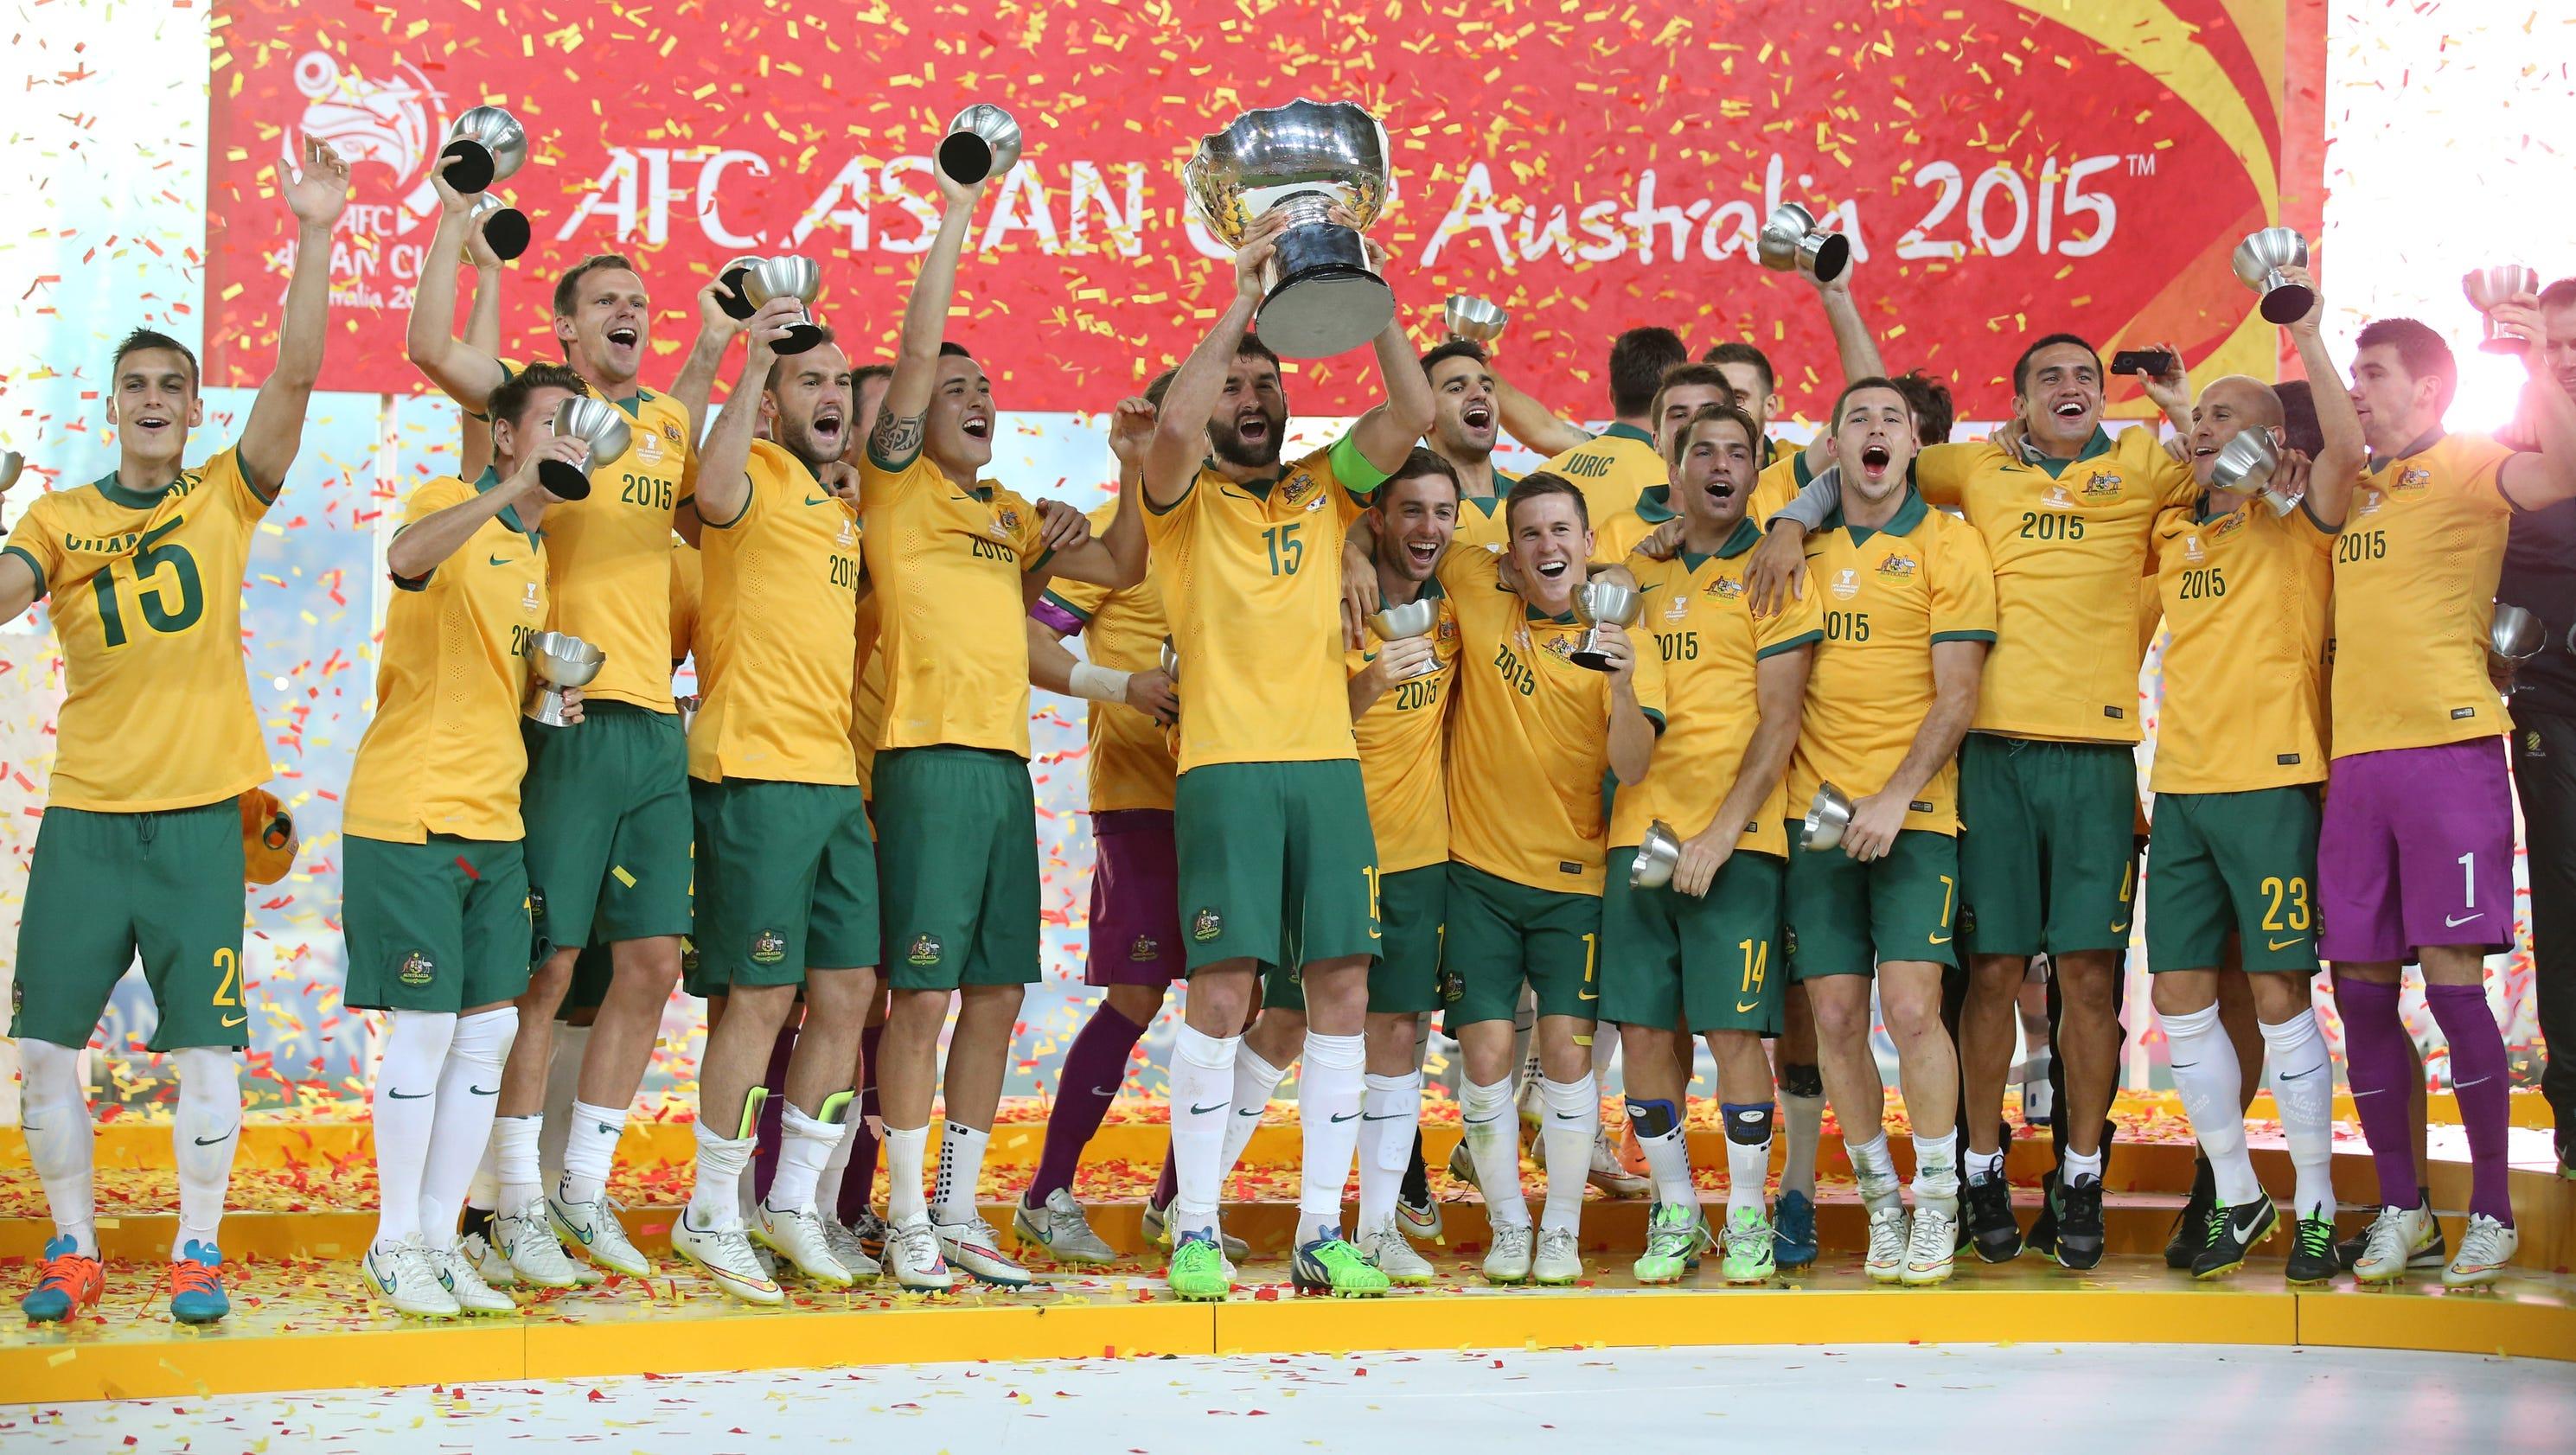 Date ariane how to win in Australia